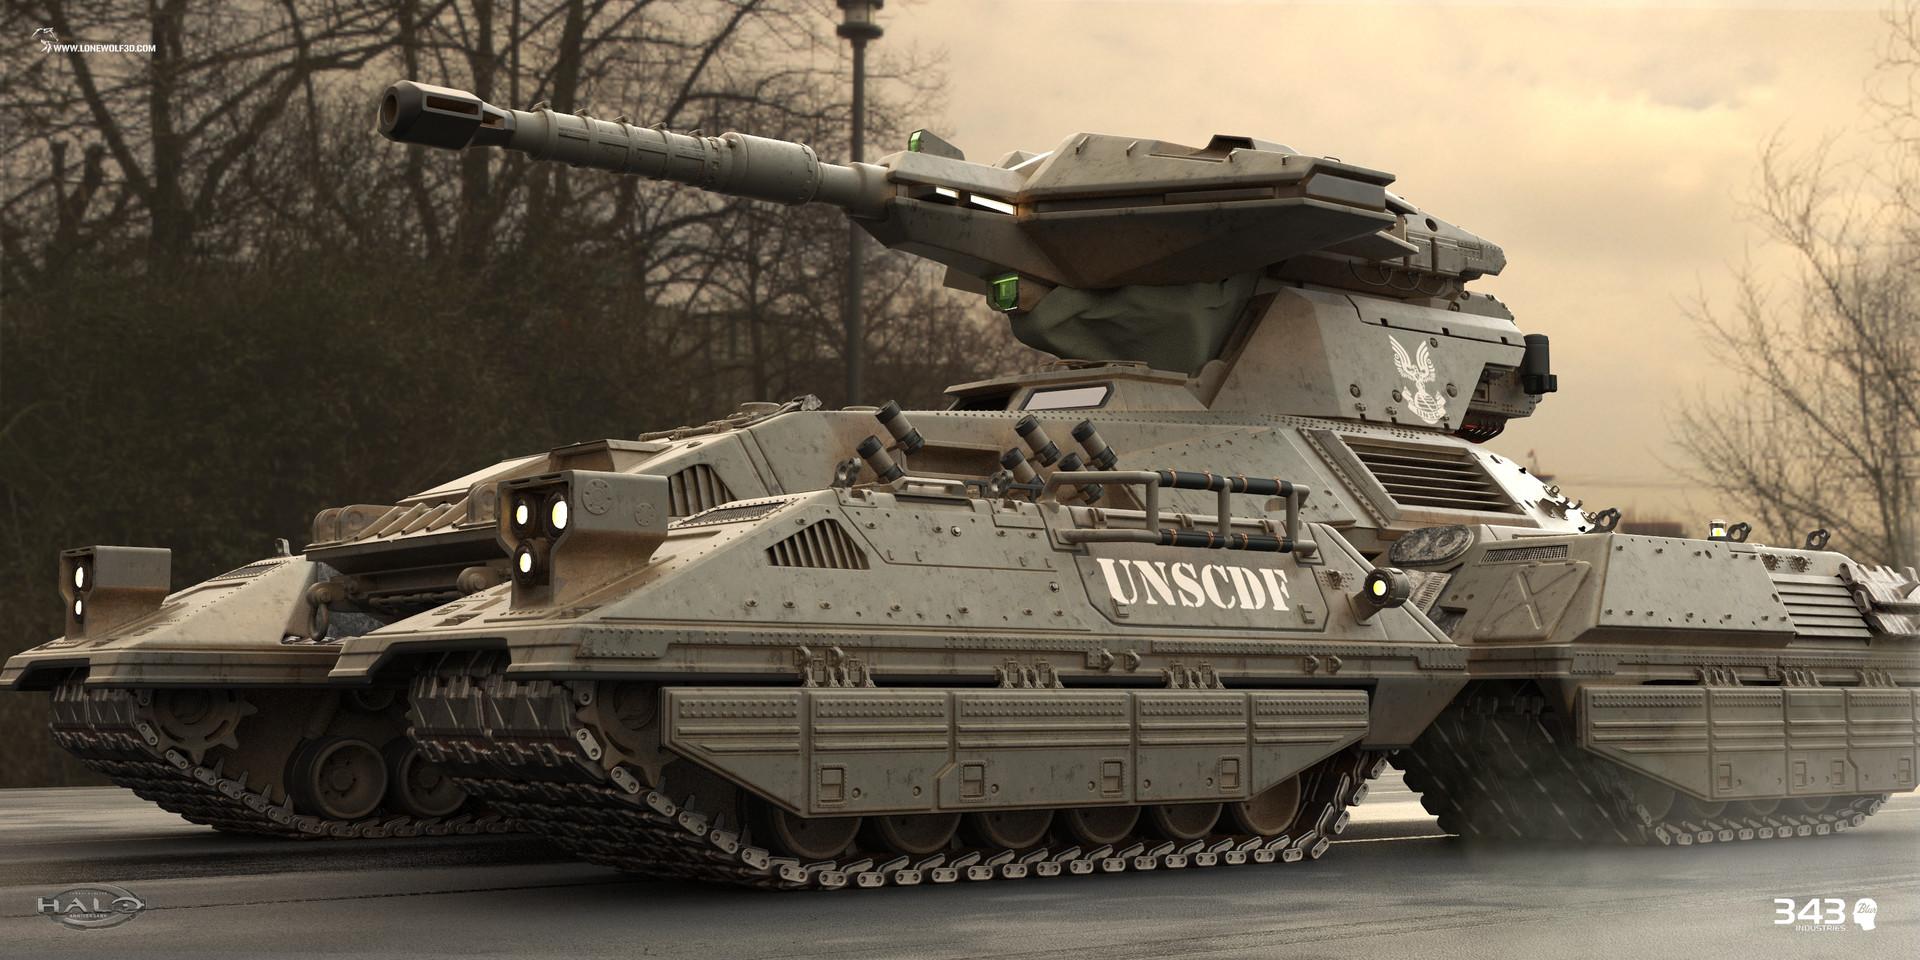 Reno levi halo anniversary scorpion tank 01